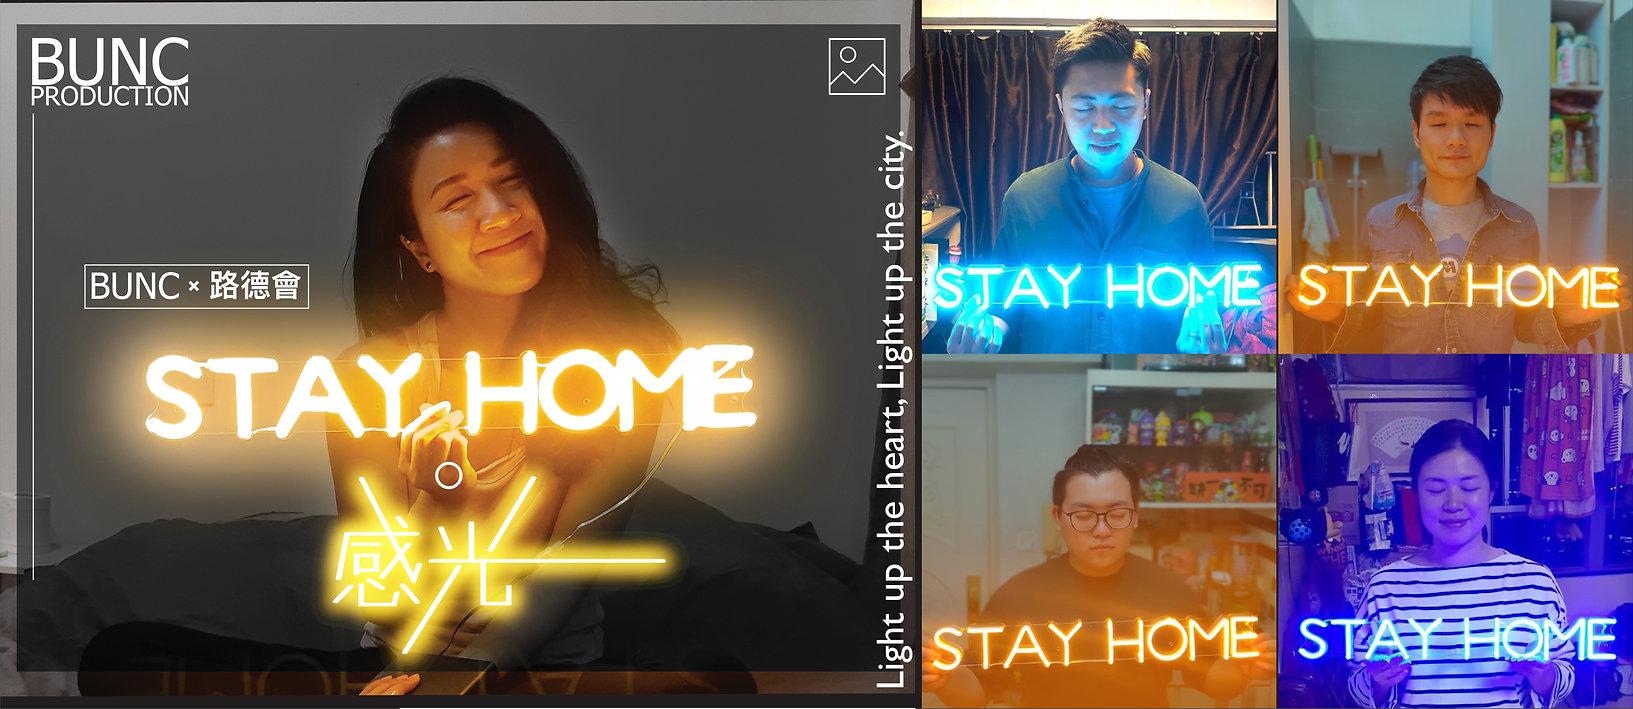 STAY HOME banner 2.jpg